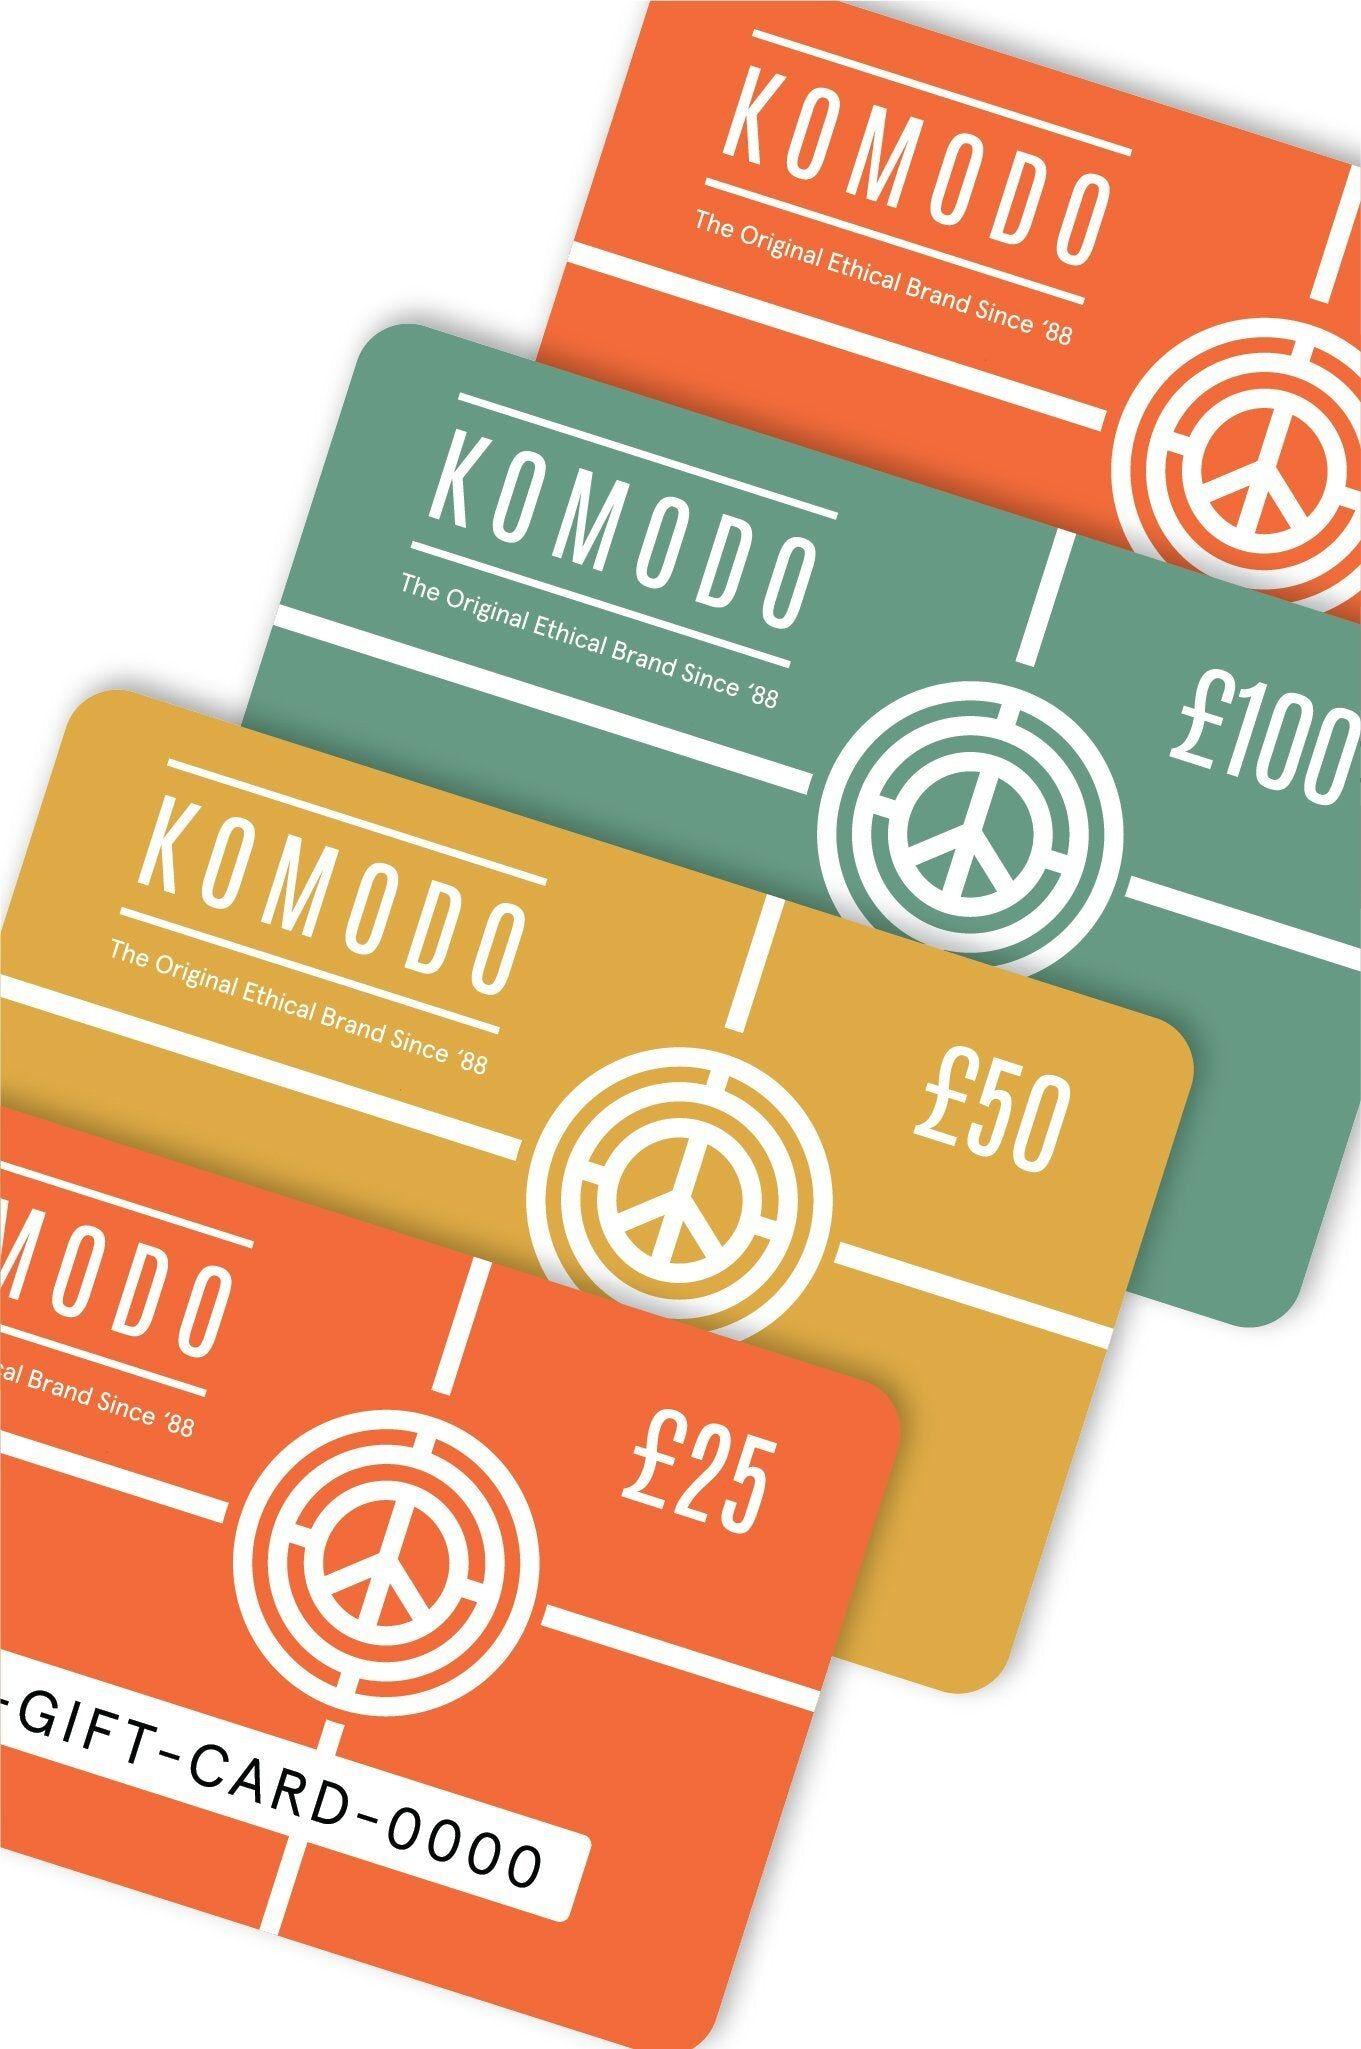 Komodo Gift Cards, £100.00